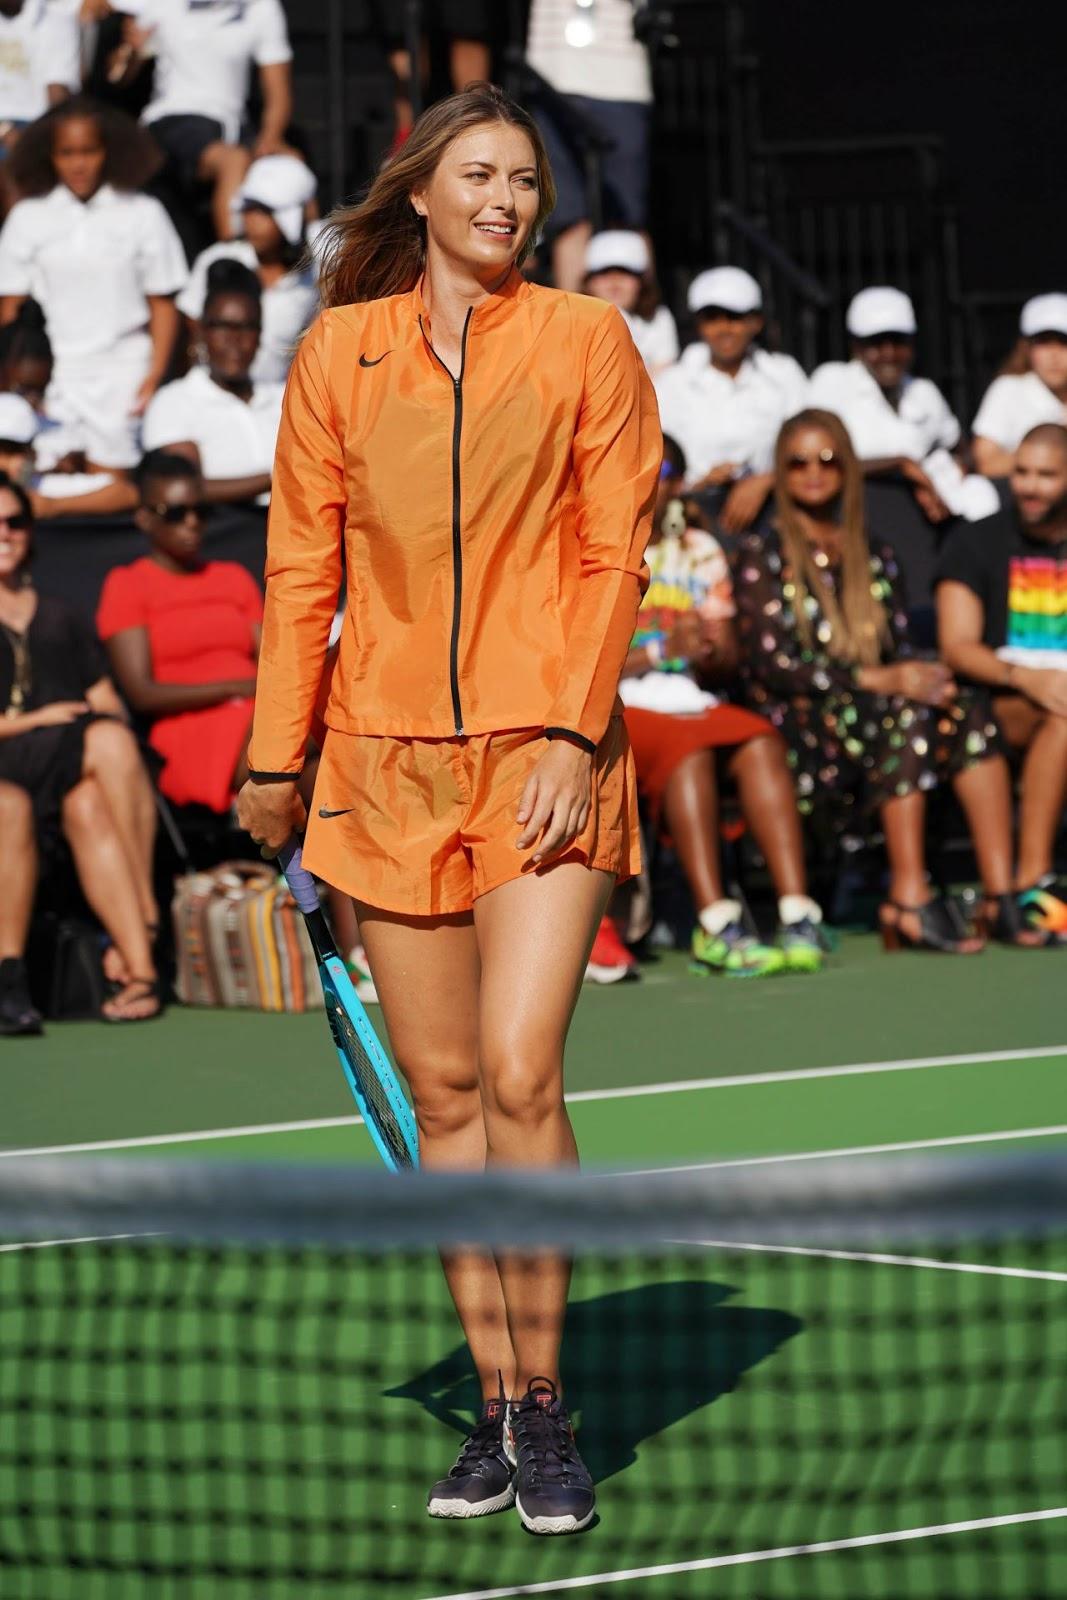 Maria Sharapova Taking a stroll in New York City - Celebzz